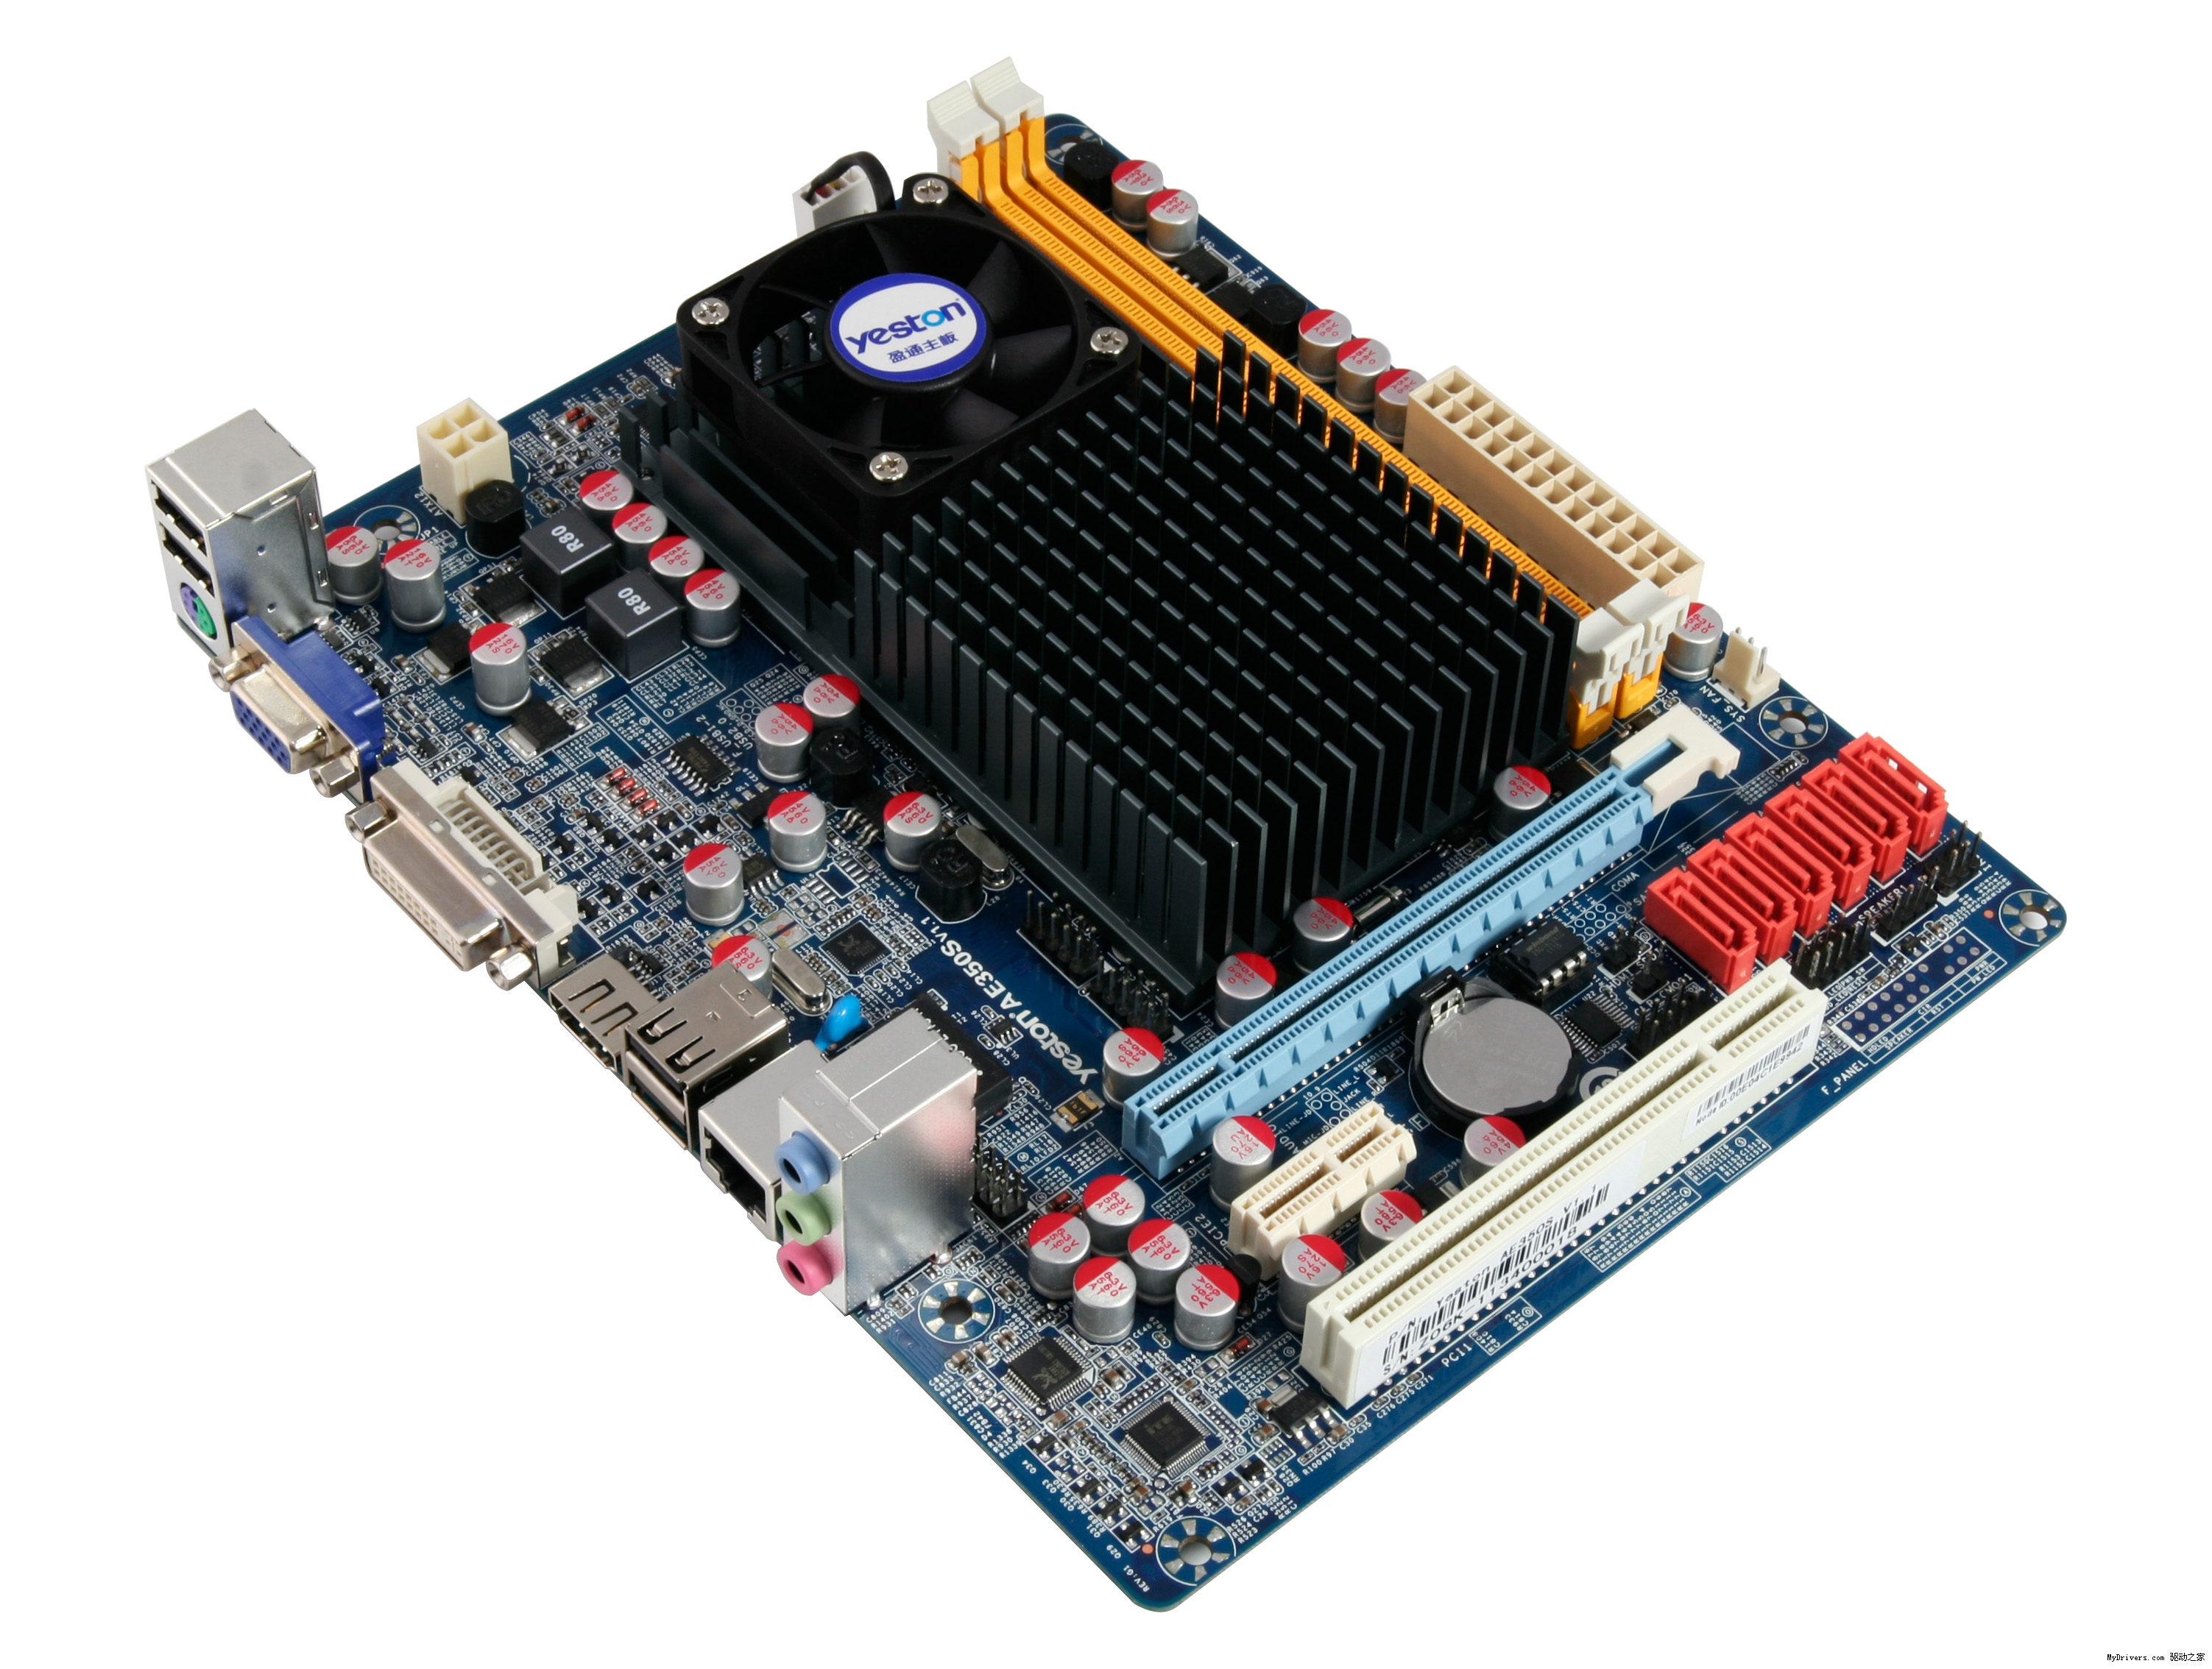 "Intel将在2013年发布继续采用22nm工艺、内核架构再次进化的Haswell处理器。据悉Haswell它将成为Intel第一颗针对主流笔记本市场设计的SoC片上系统处理器。SoC芯片都具备超高集成度,往往一颗芯片就能提供一套系统的全部处理能力,所以称之为""芯片上的系统""。Hawsell将会把CPU处理器、GPU图形核心、南北桥芯片、内存控制器、PCI-E控制器等等所有模块统统集成到一起,不再需要AMD/NV等其他任何辅助芯片。依稀记得十多年前INTEL搞了个I810主板的时候"